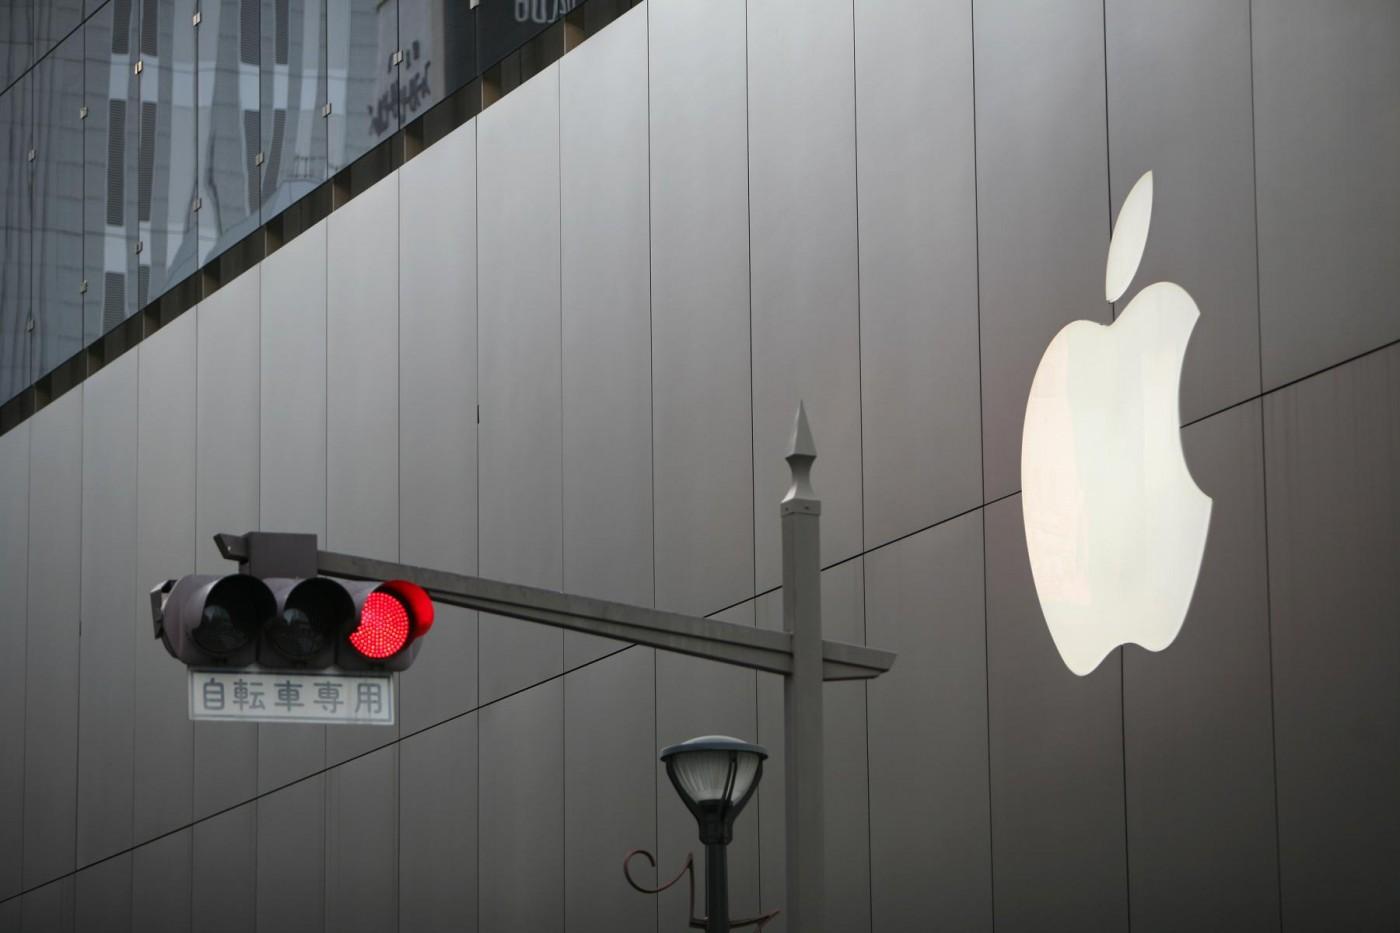 Google收購Apple假新聞流竄,道瓊通訊社誤發原因曝光